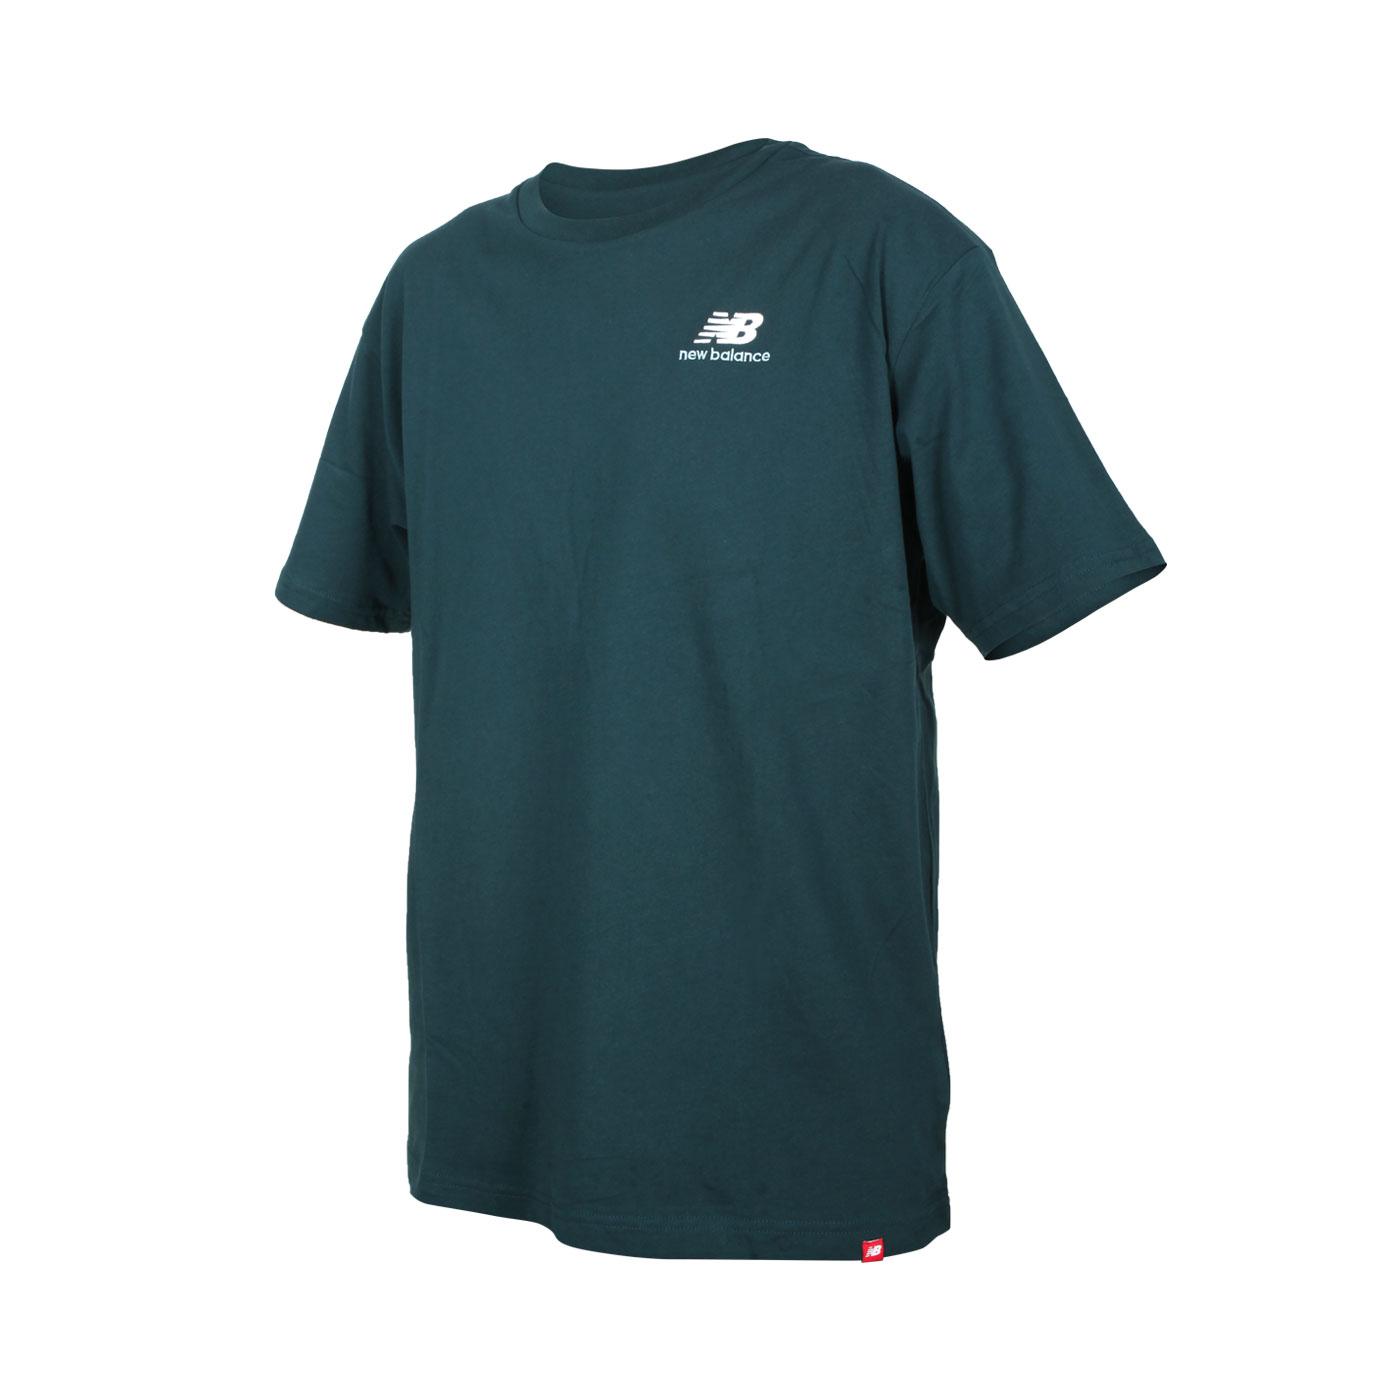 NEW BALANCE 男款短袖T恤 MT11592TKK